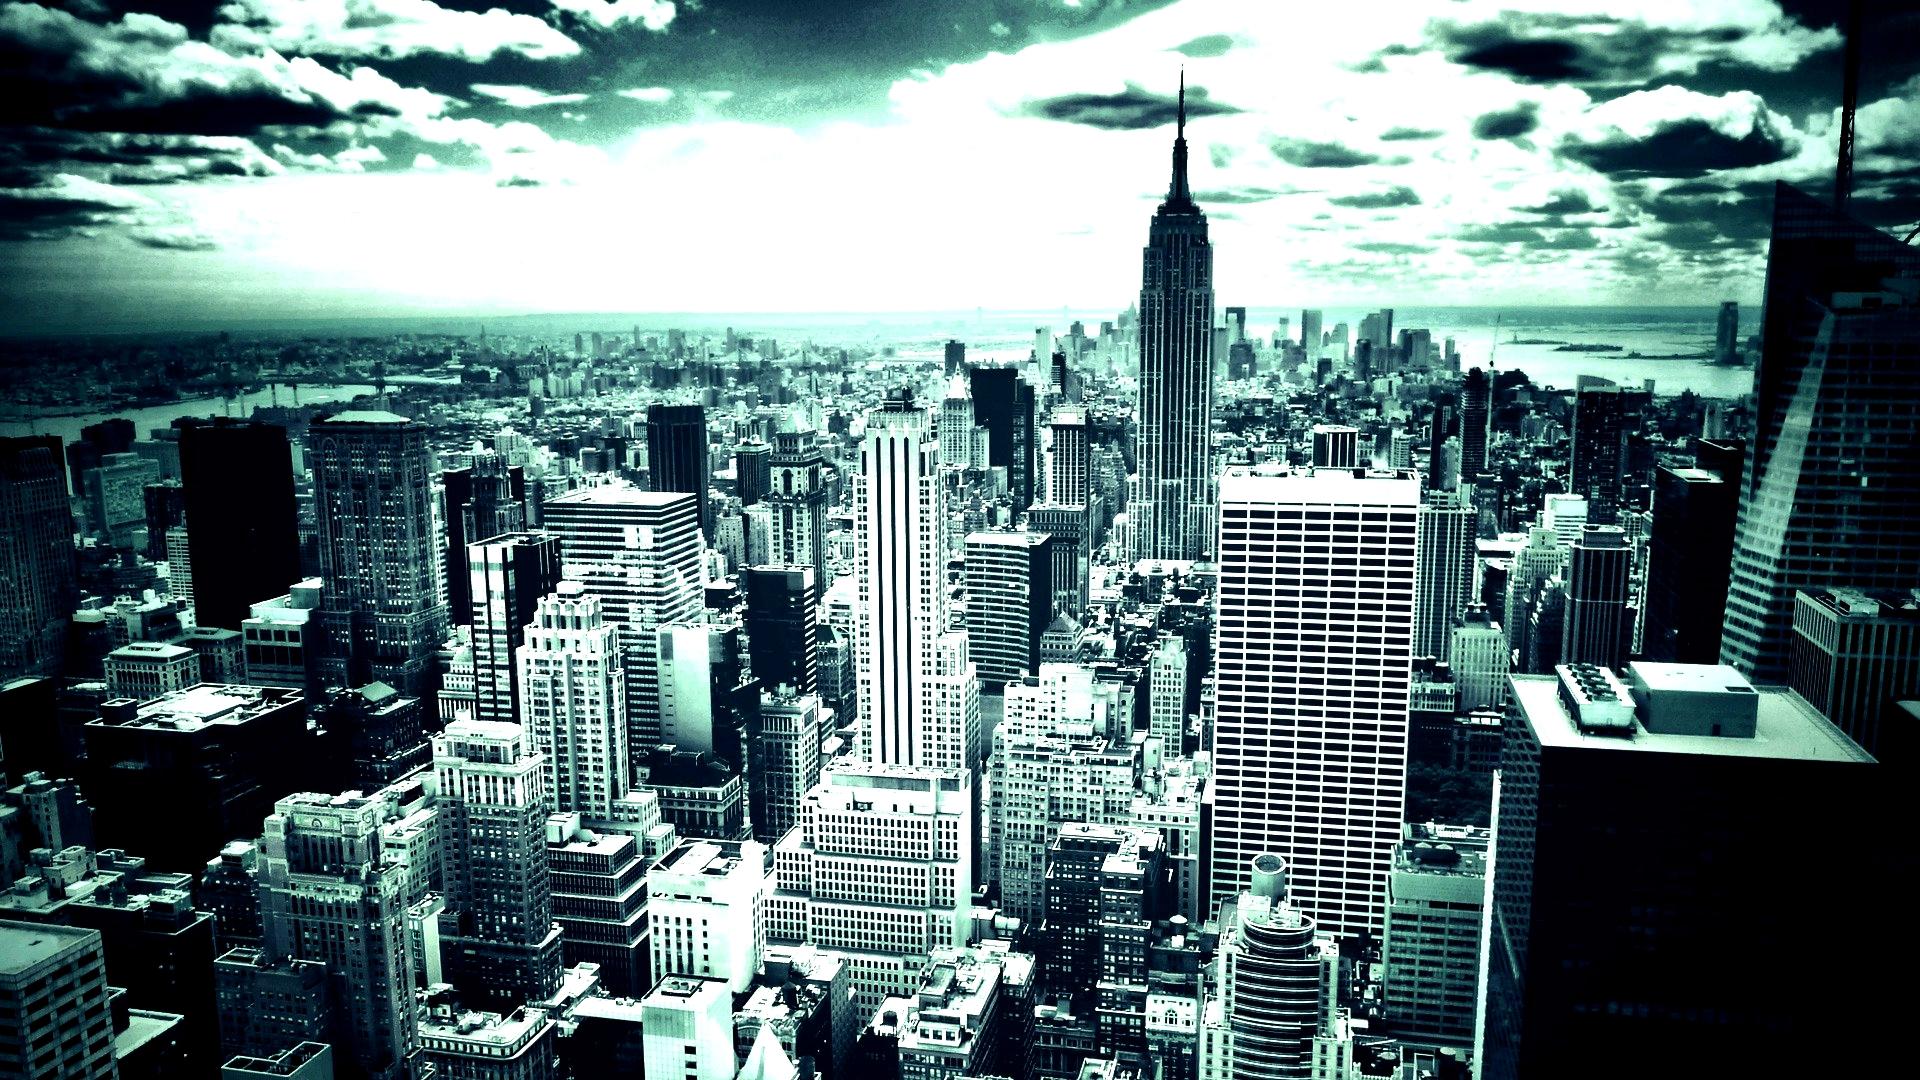 New York Fall Wallpaper Free Download Cityscape Backgrounds Pixelstalk Net